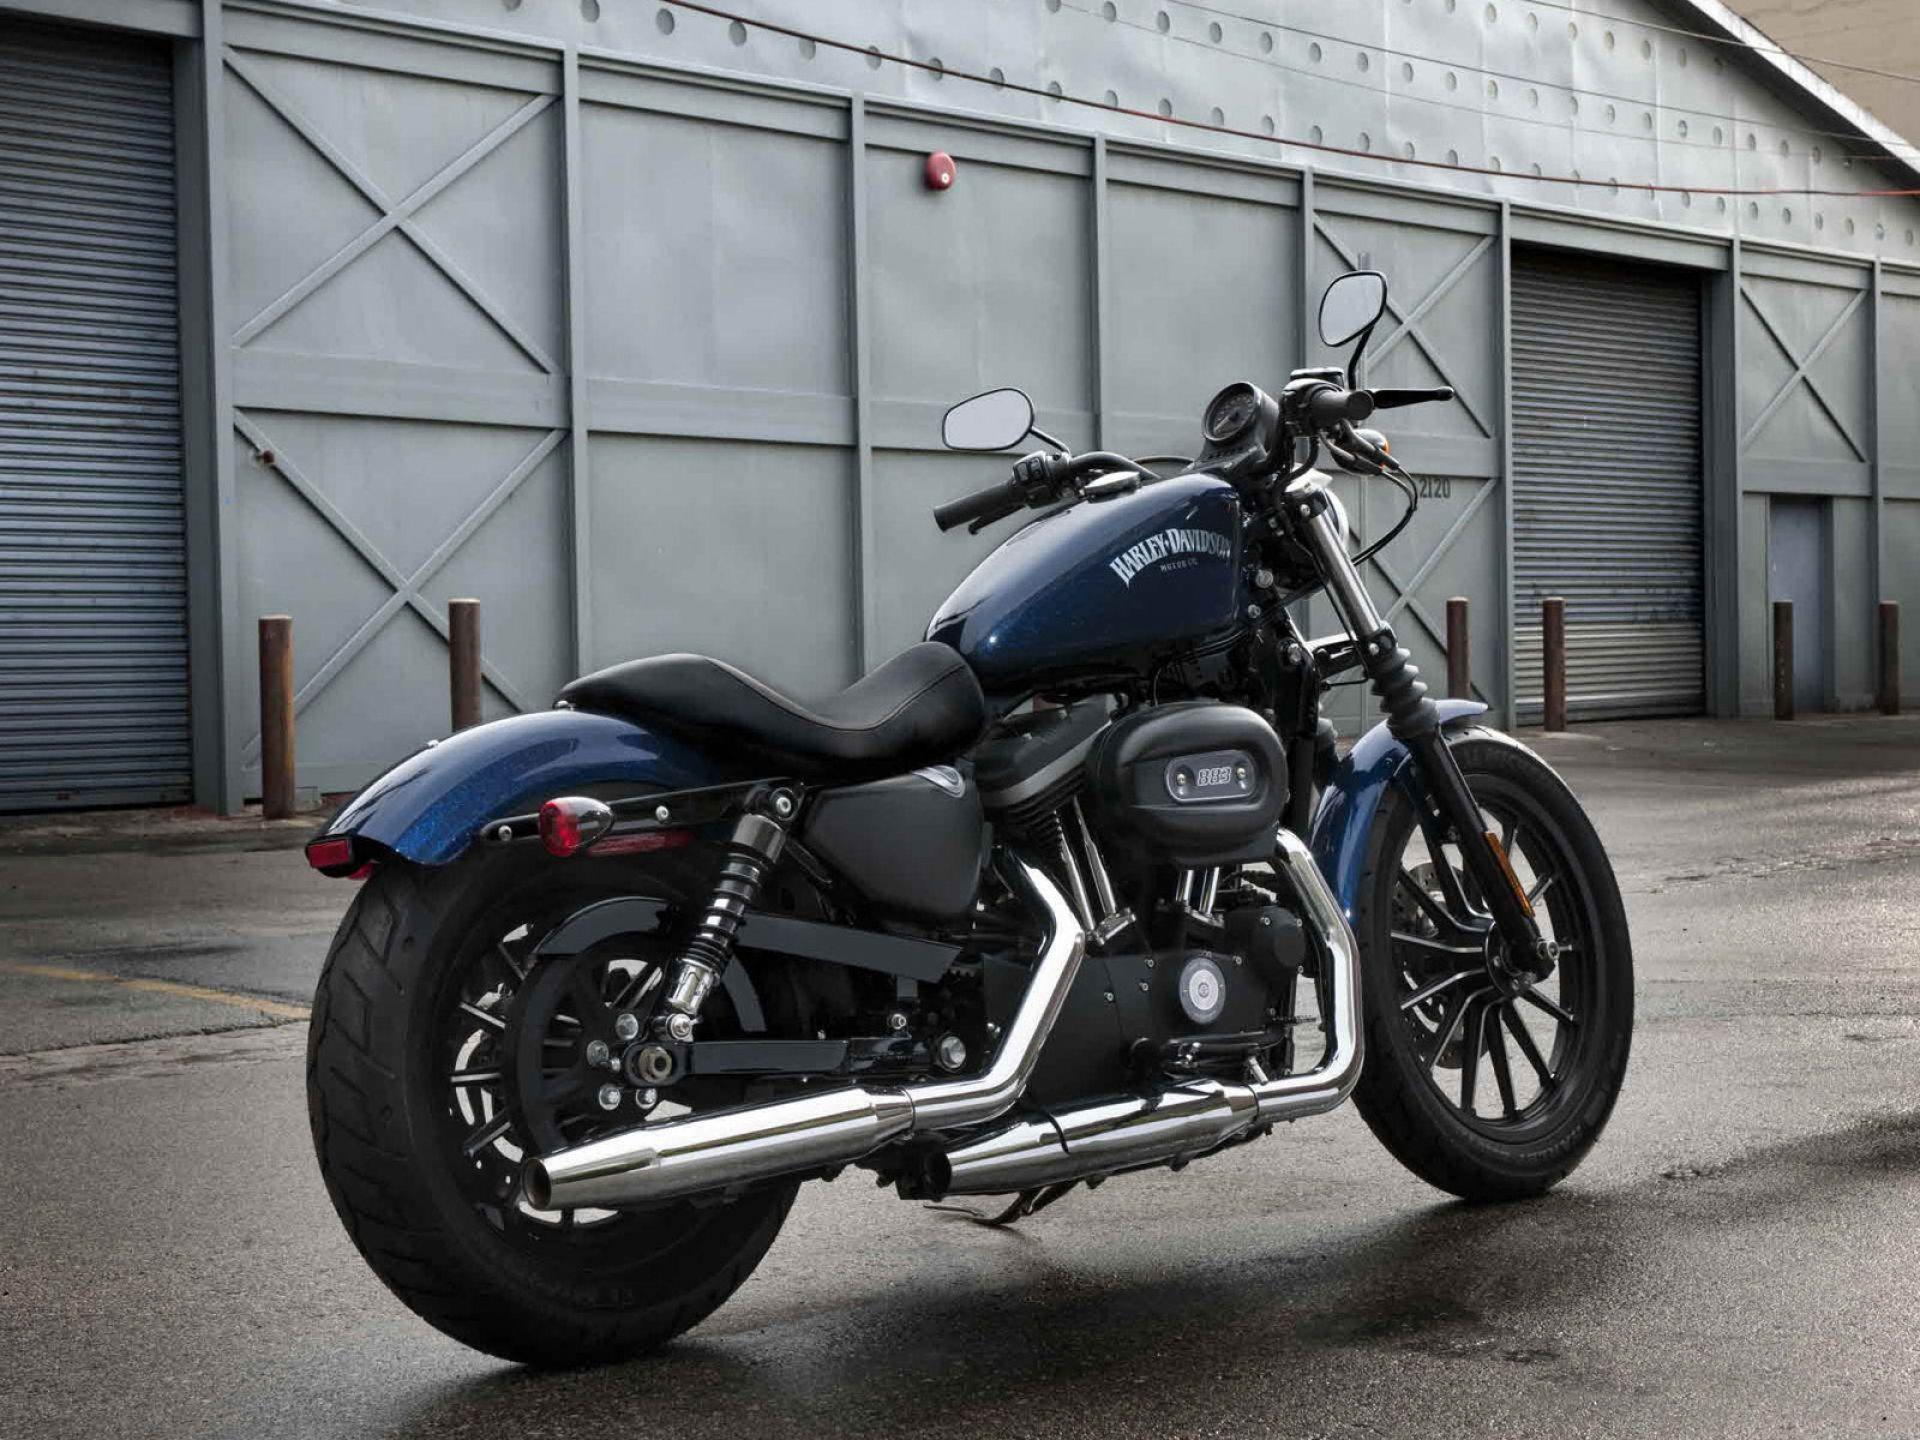 harley davidson iron 883 motorcycle hd wallpapers | coisas para